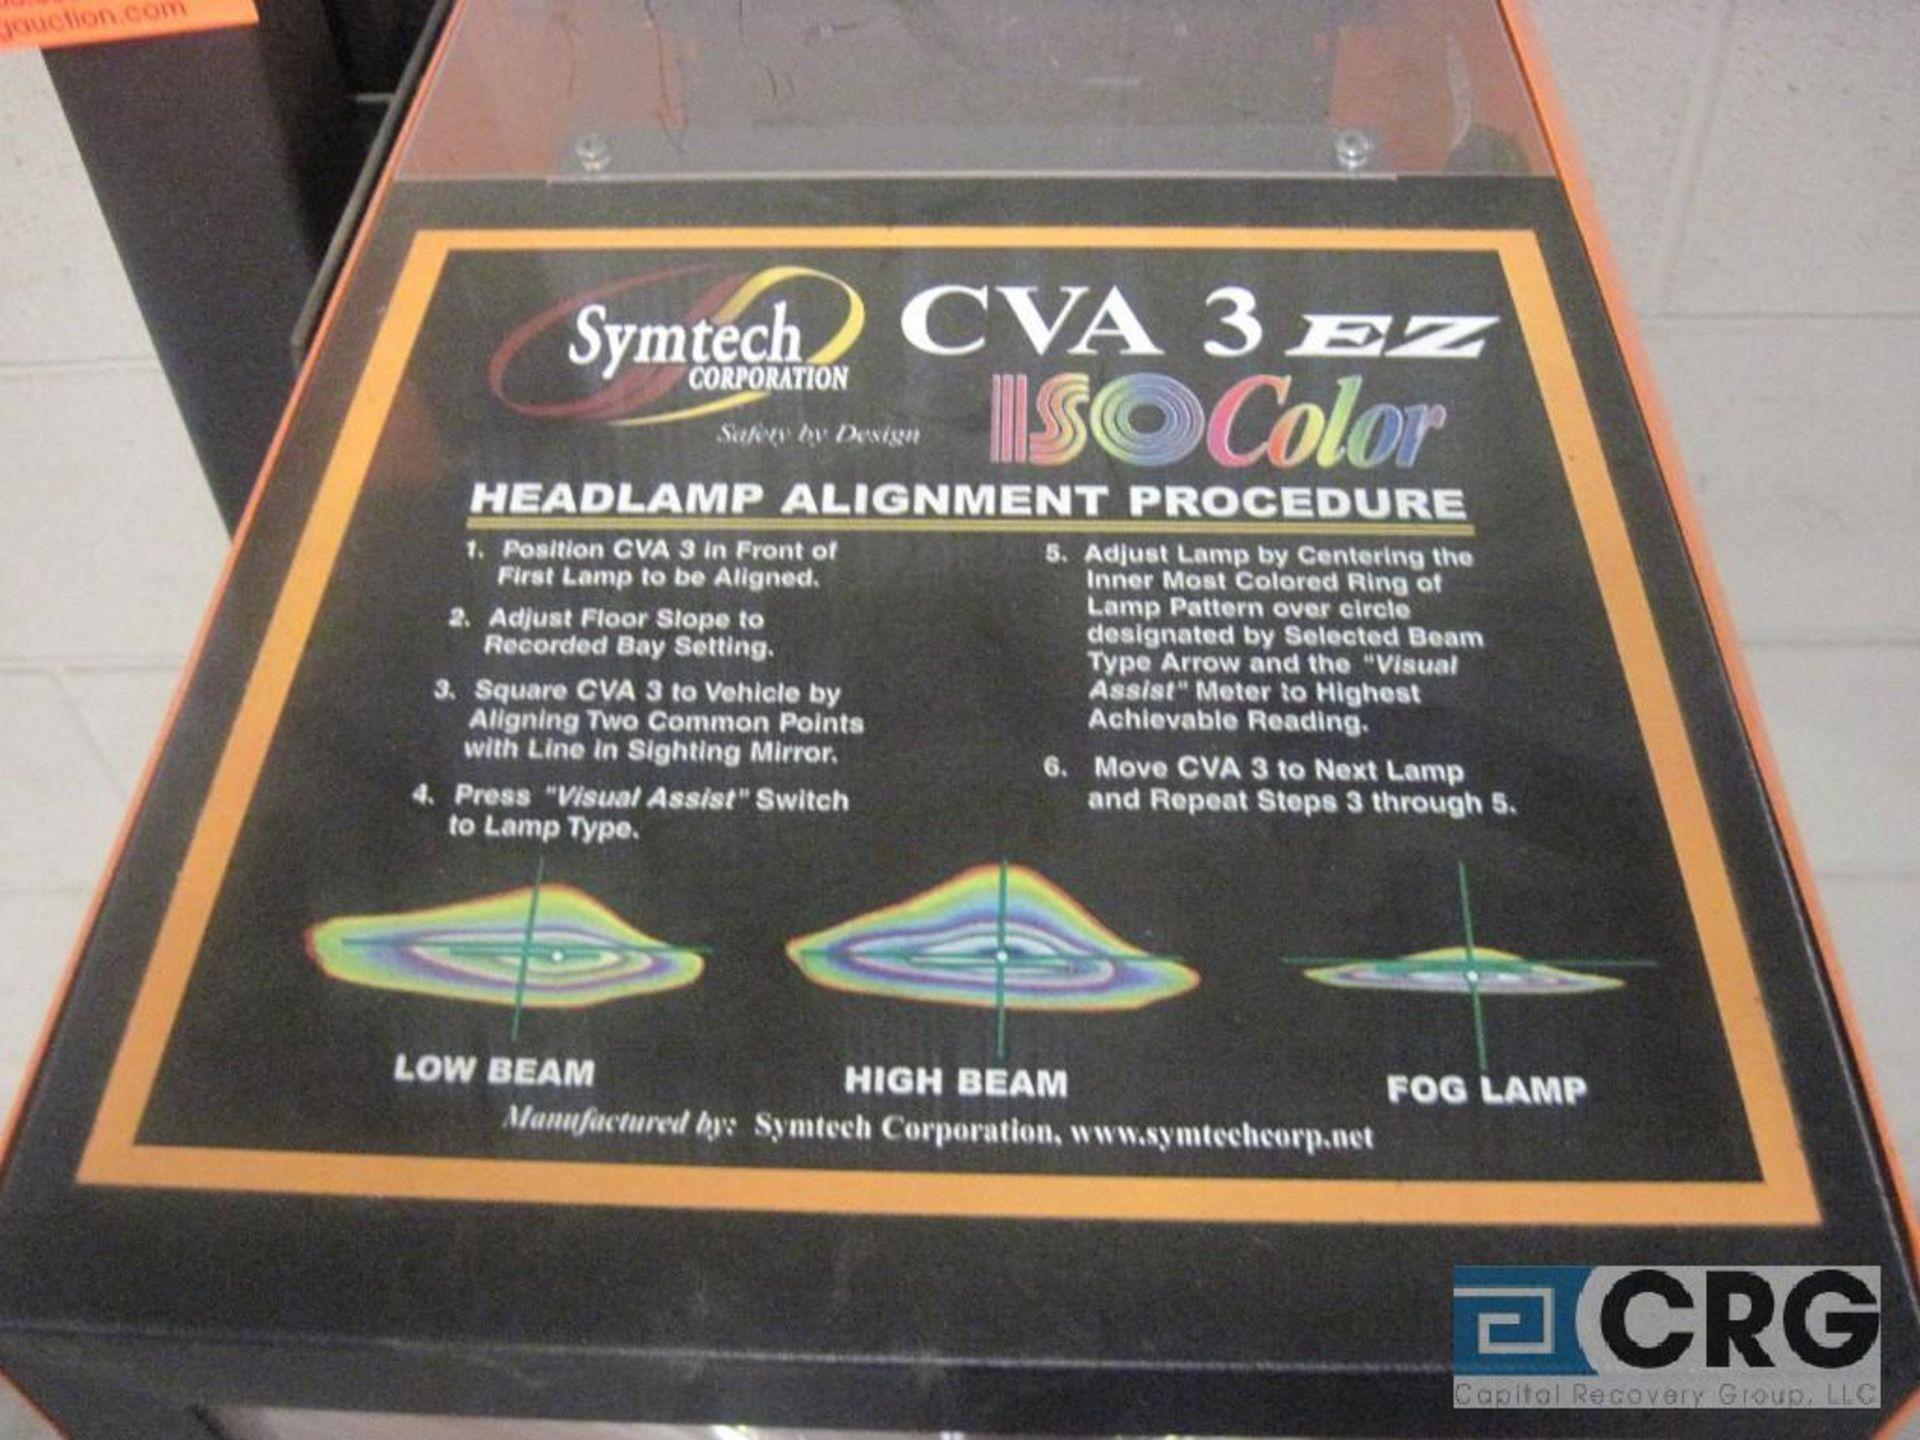 Symtech CVA 3E2 head lamp alignment system - Image 2 of 2